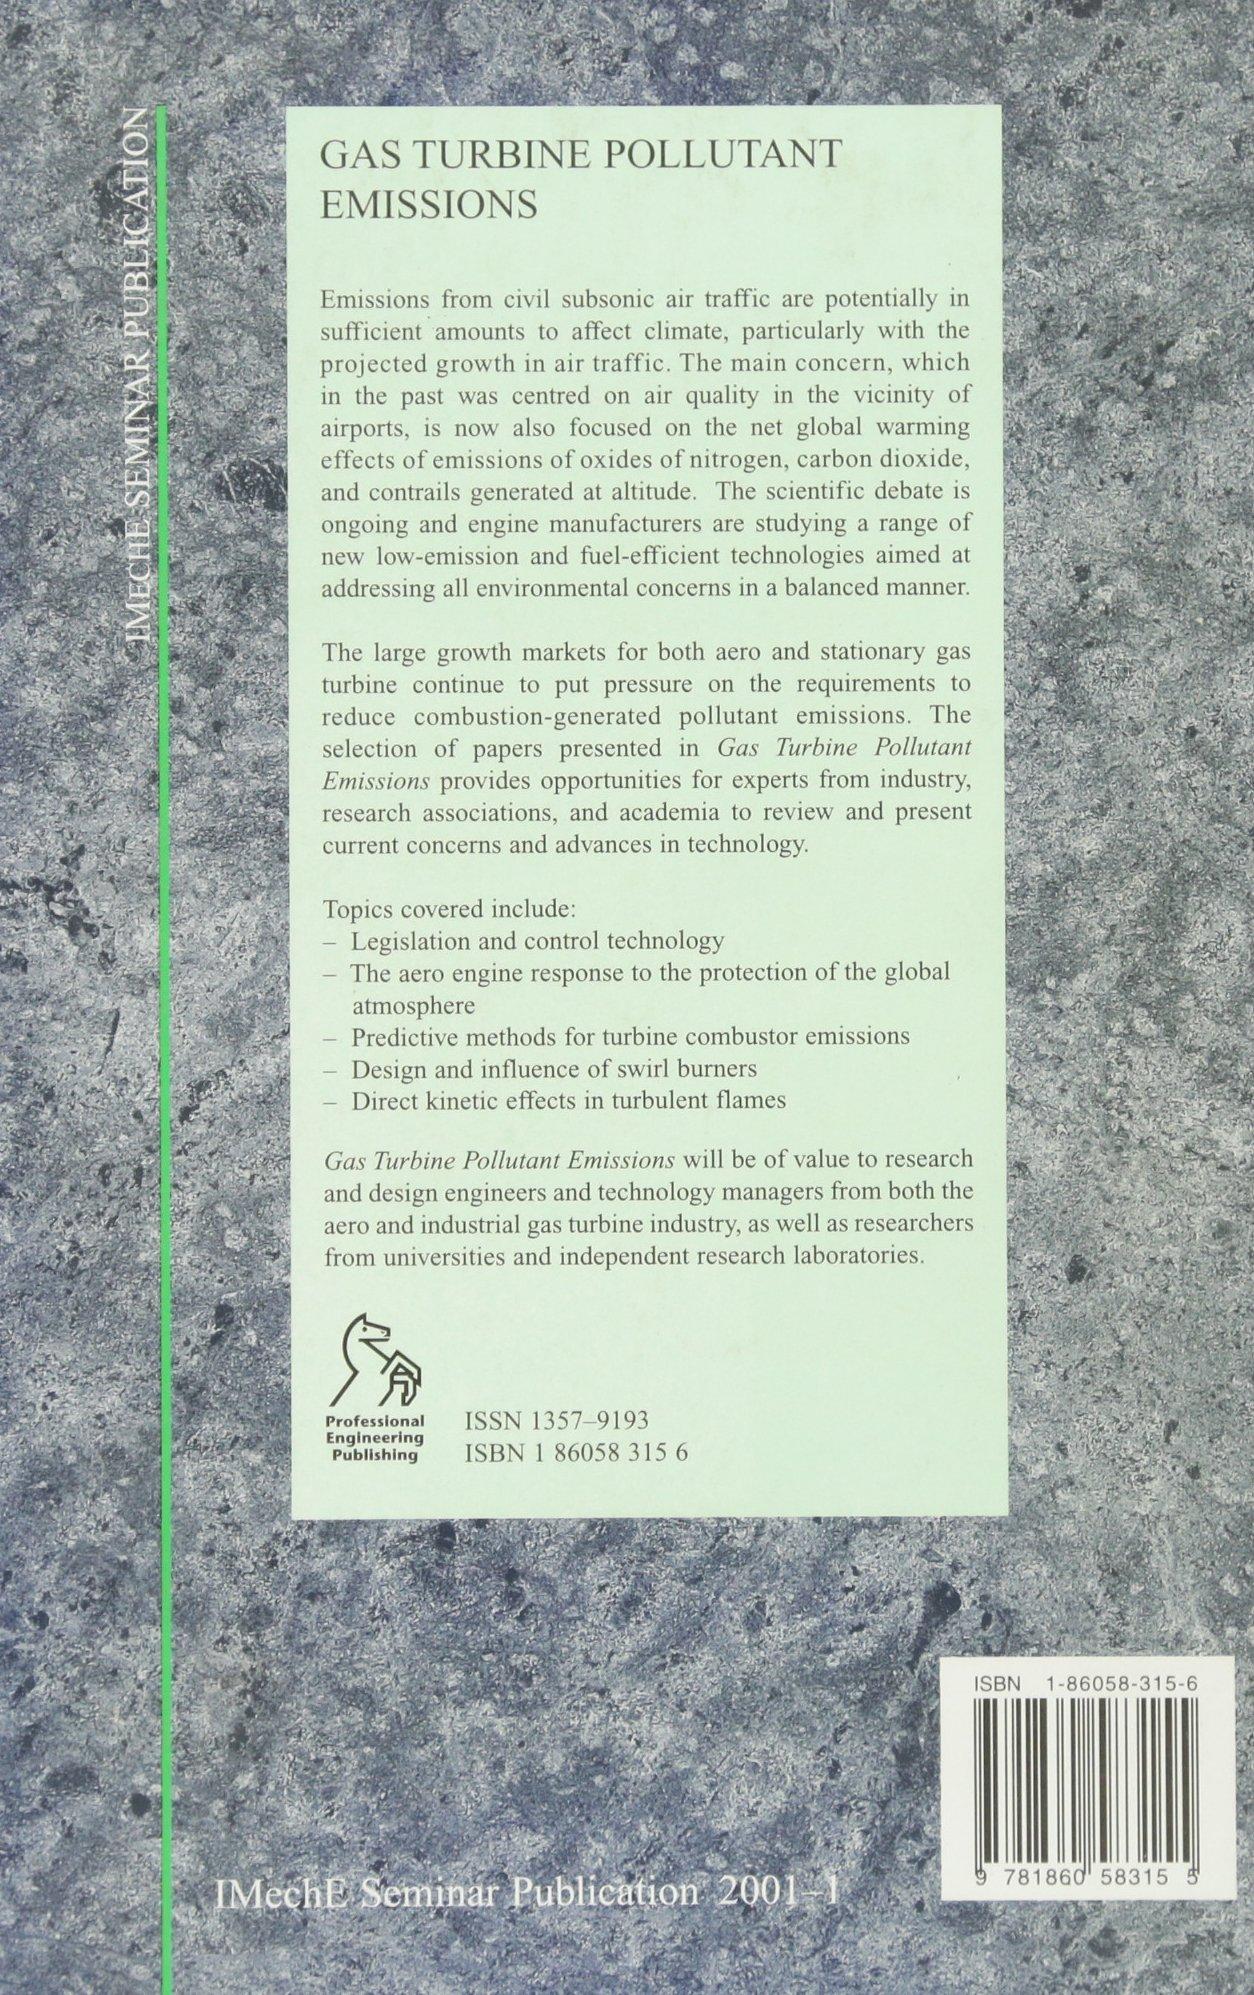 Gas Turbine Pollutant Emissions IMechE Seminar Publications